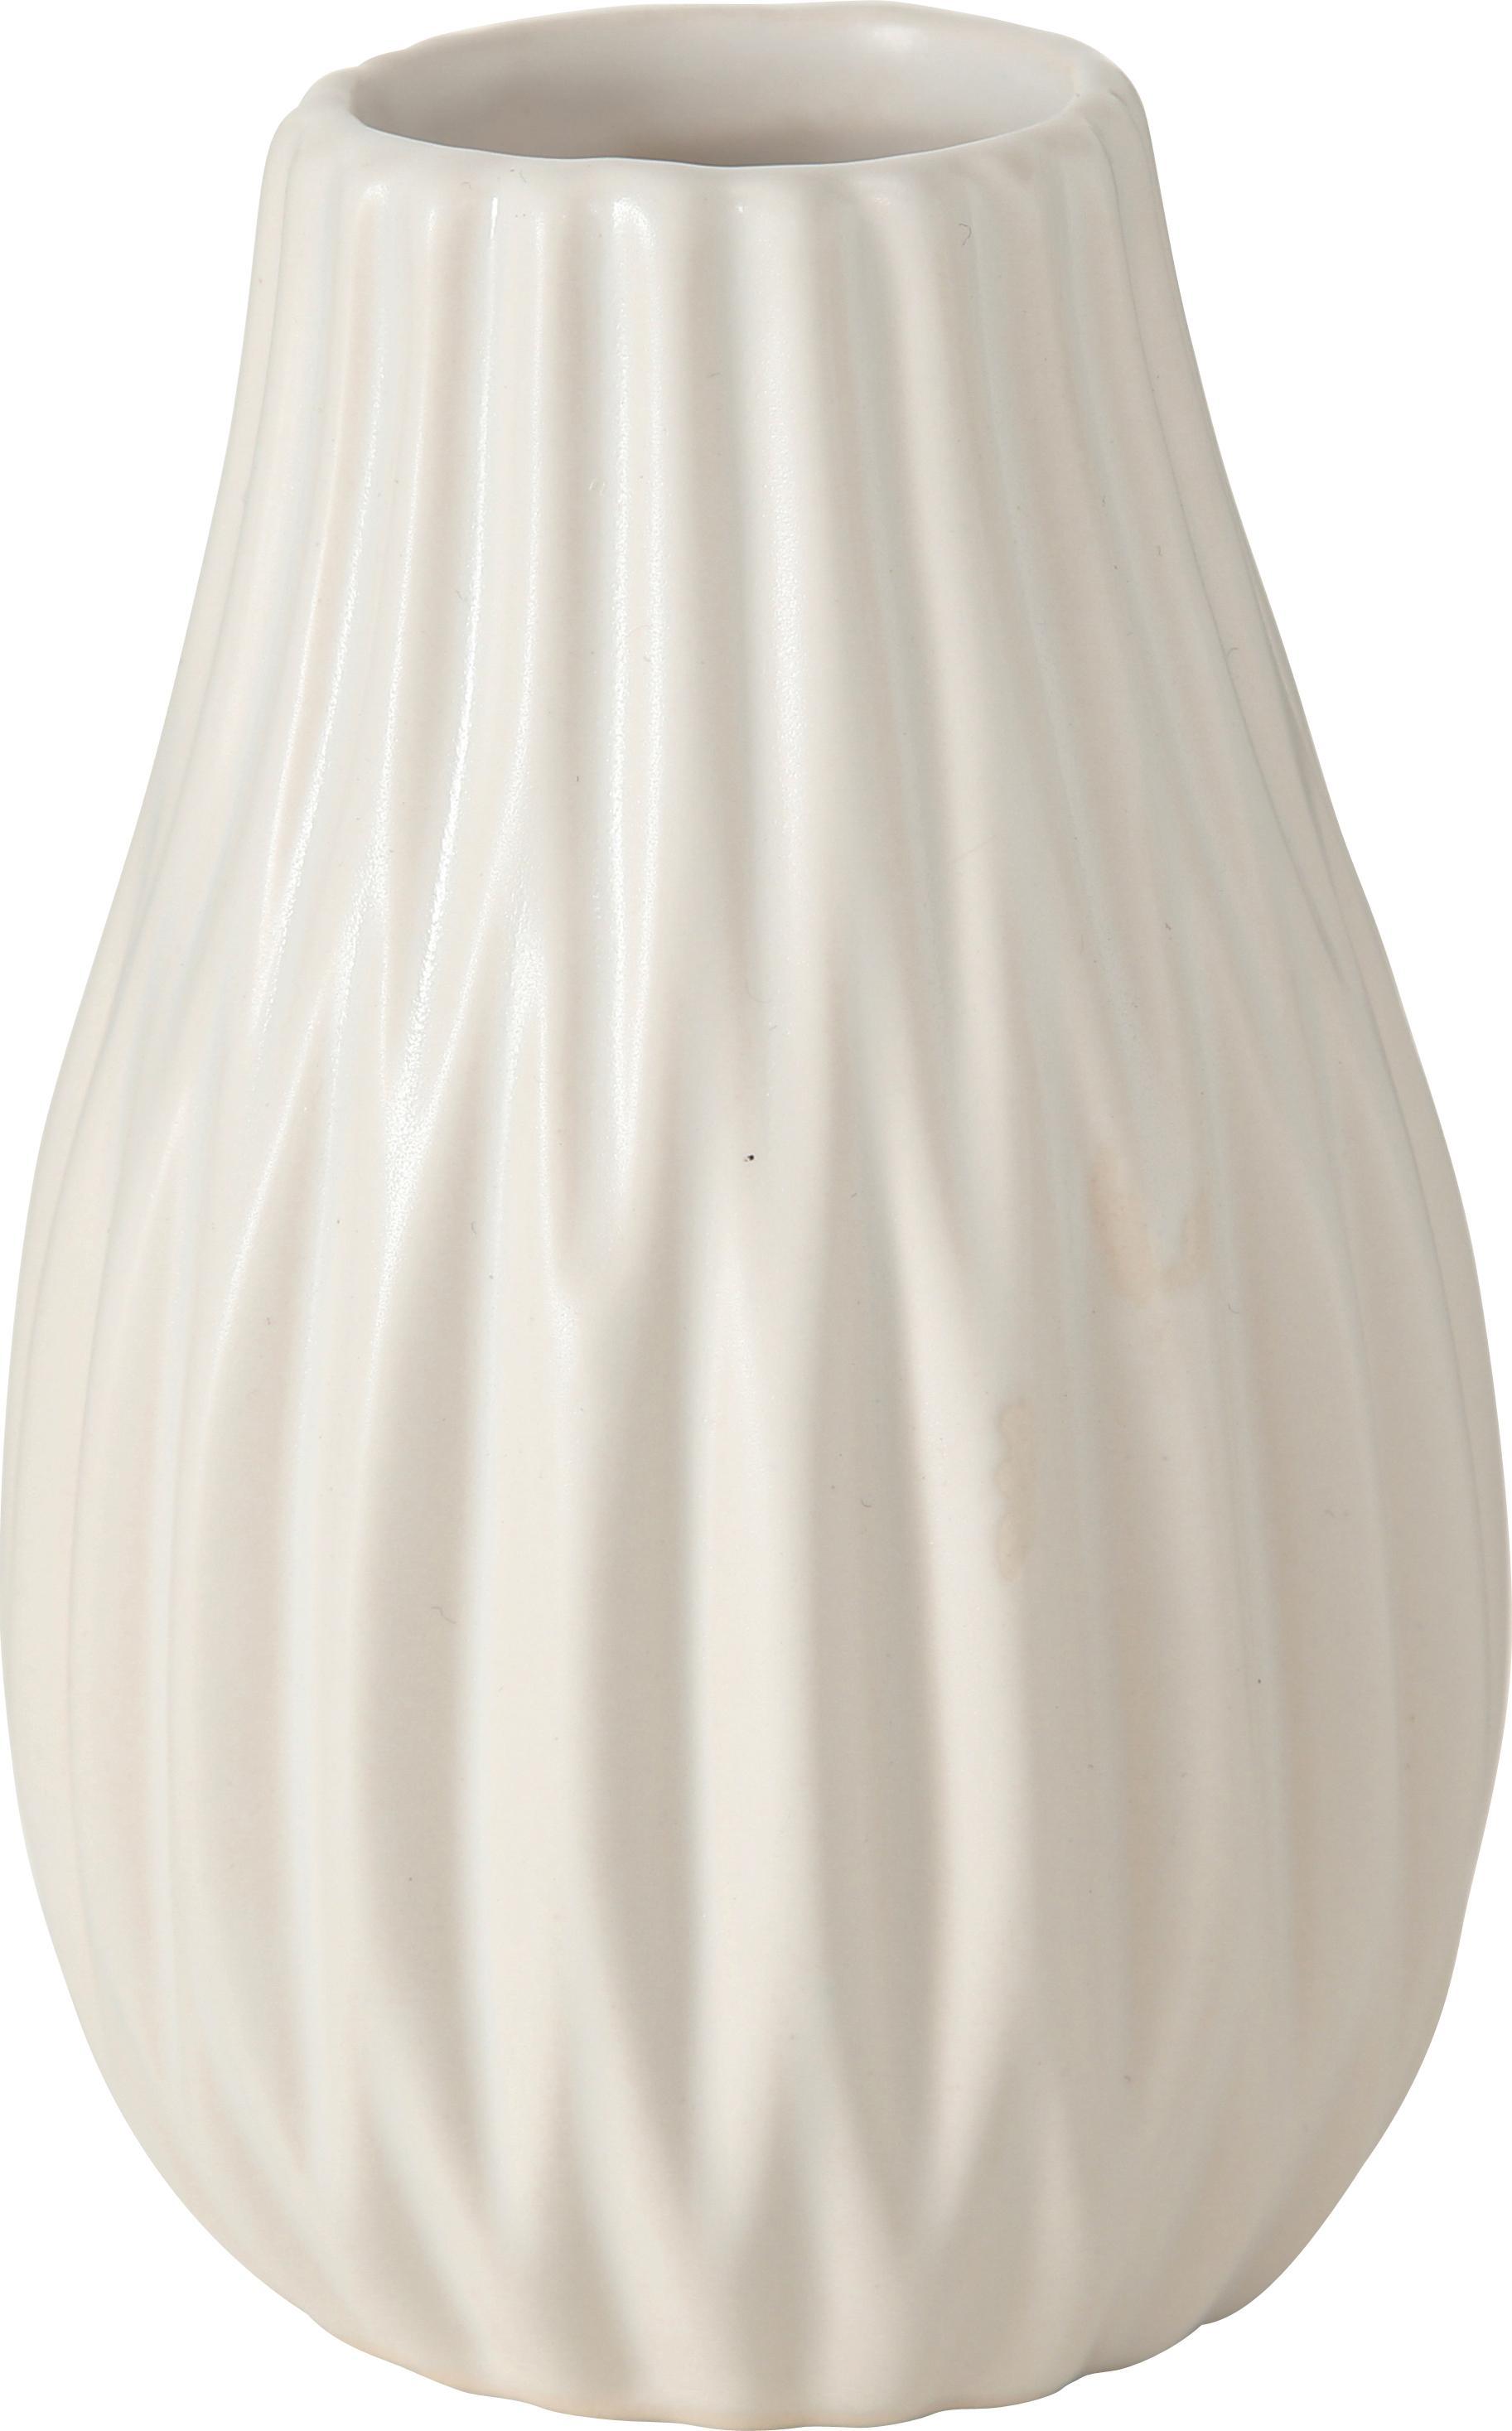 Vazenset Wilma, 3-delig, Keramiek, Grijs, wit, roze, Ø 8 x H 14 cm